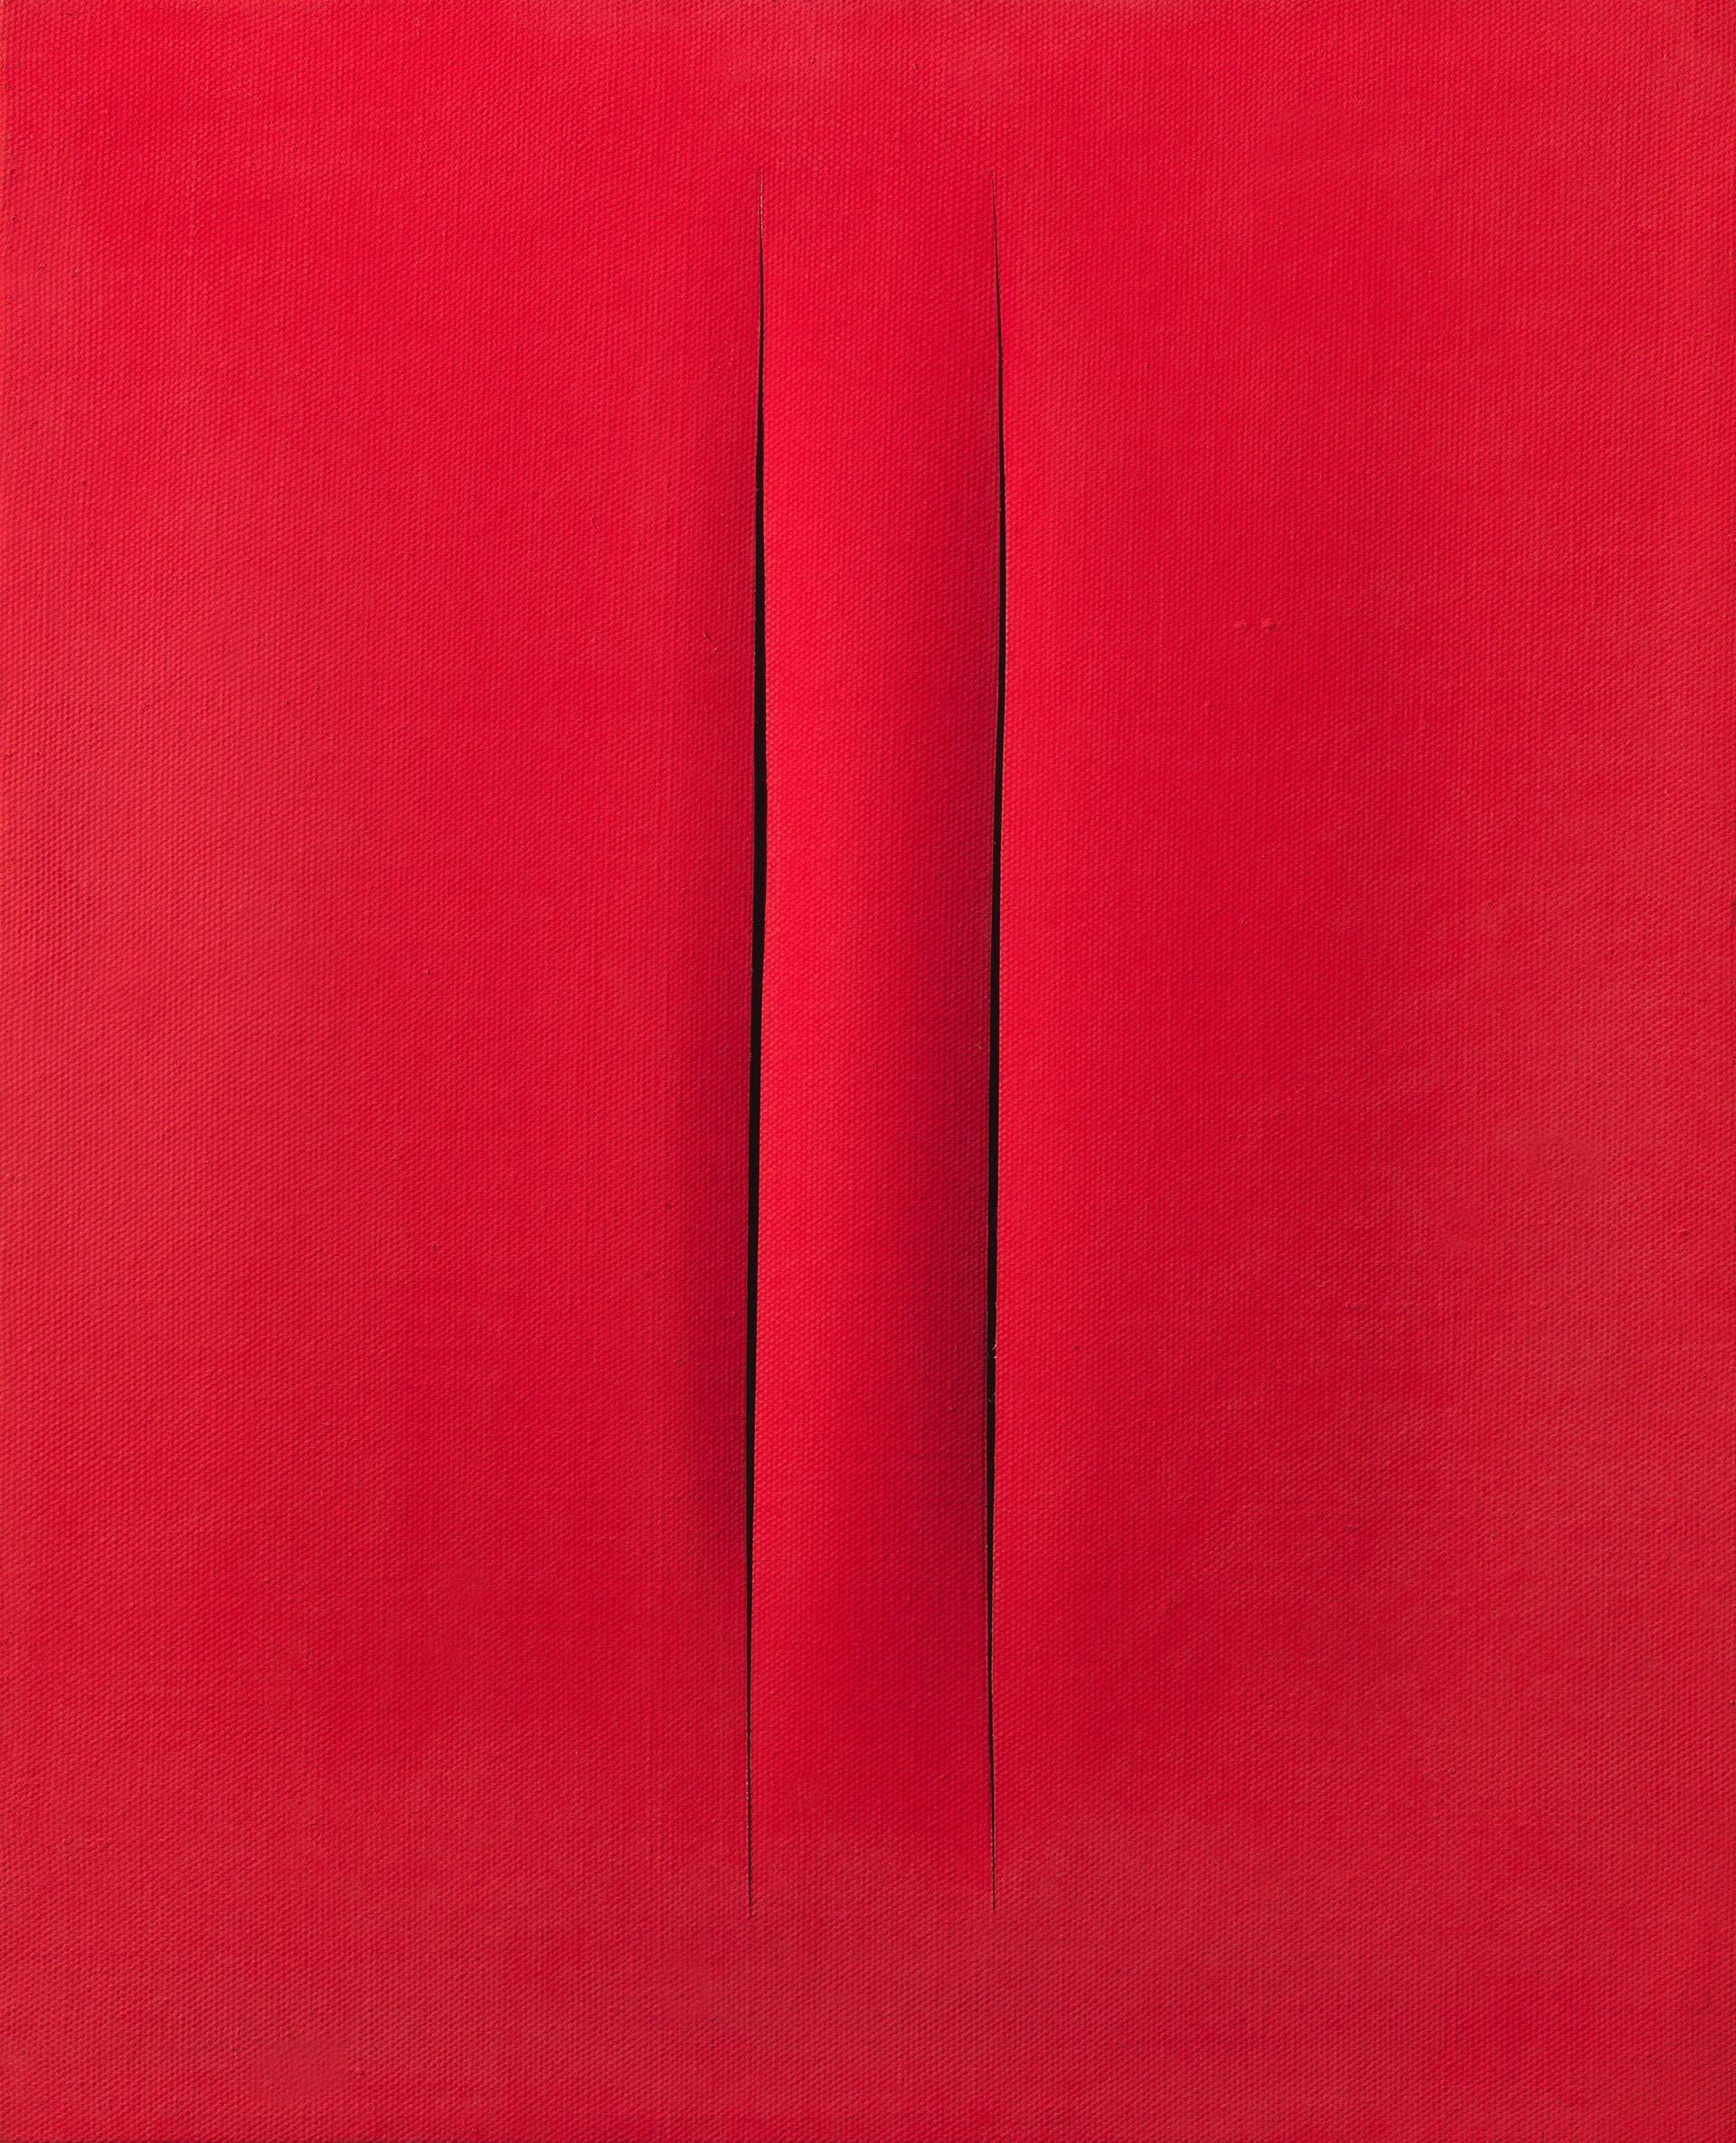 Fontana_Concetto-spaziale-Attese_1967_61x50-cm